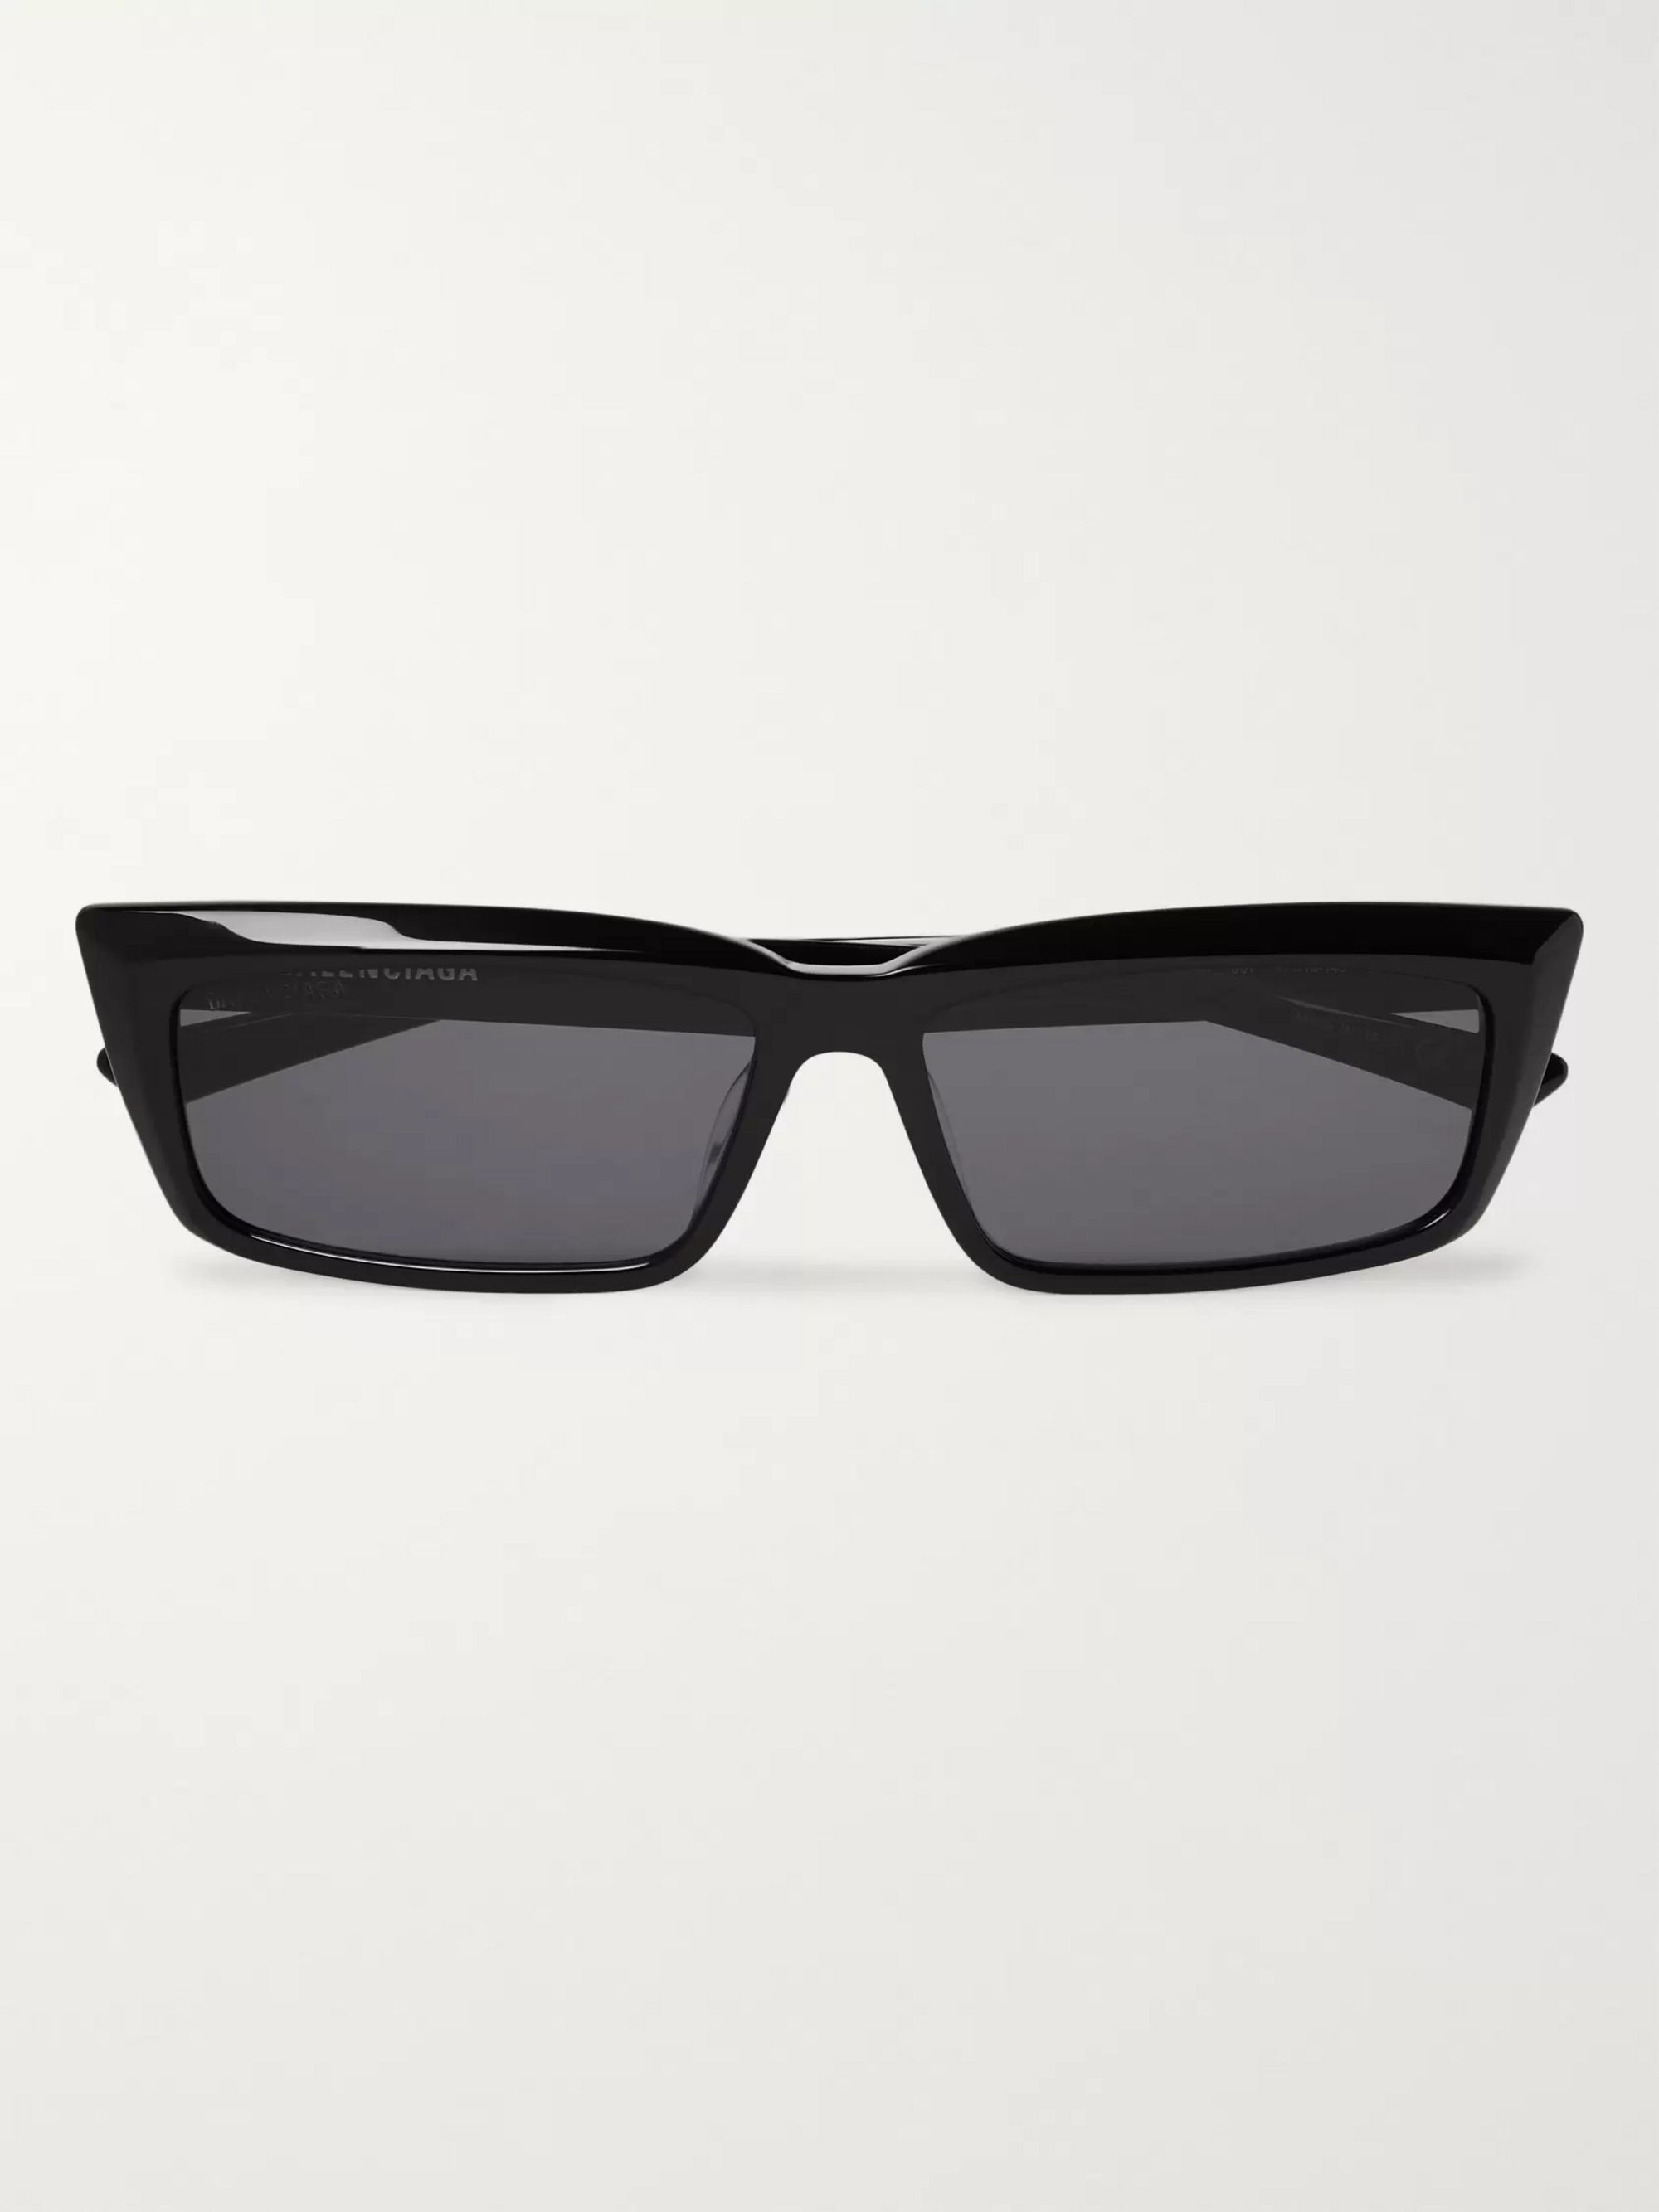 Rectangular Frame Acetate Sunglasses by Balenciaga